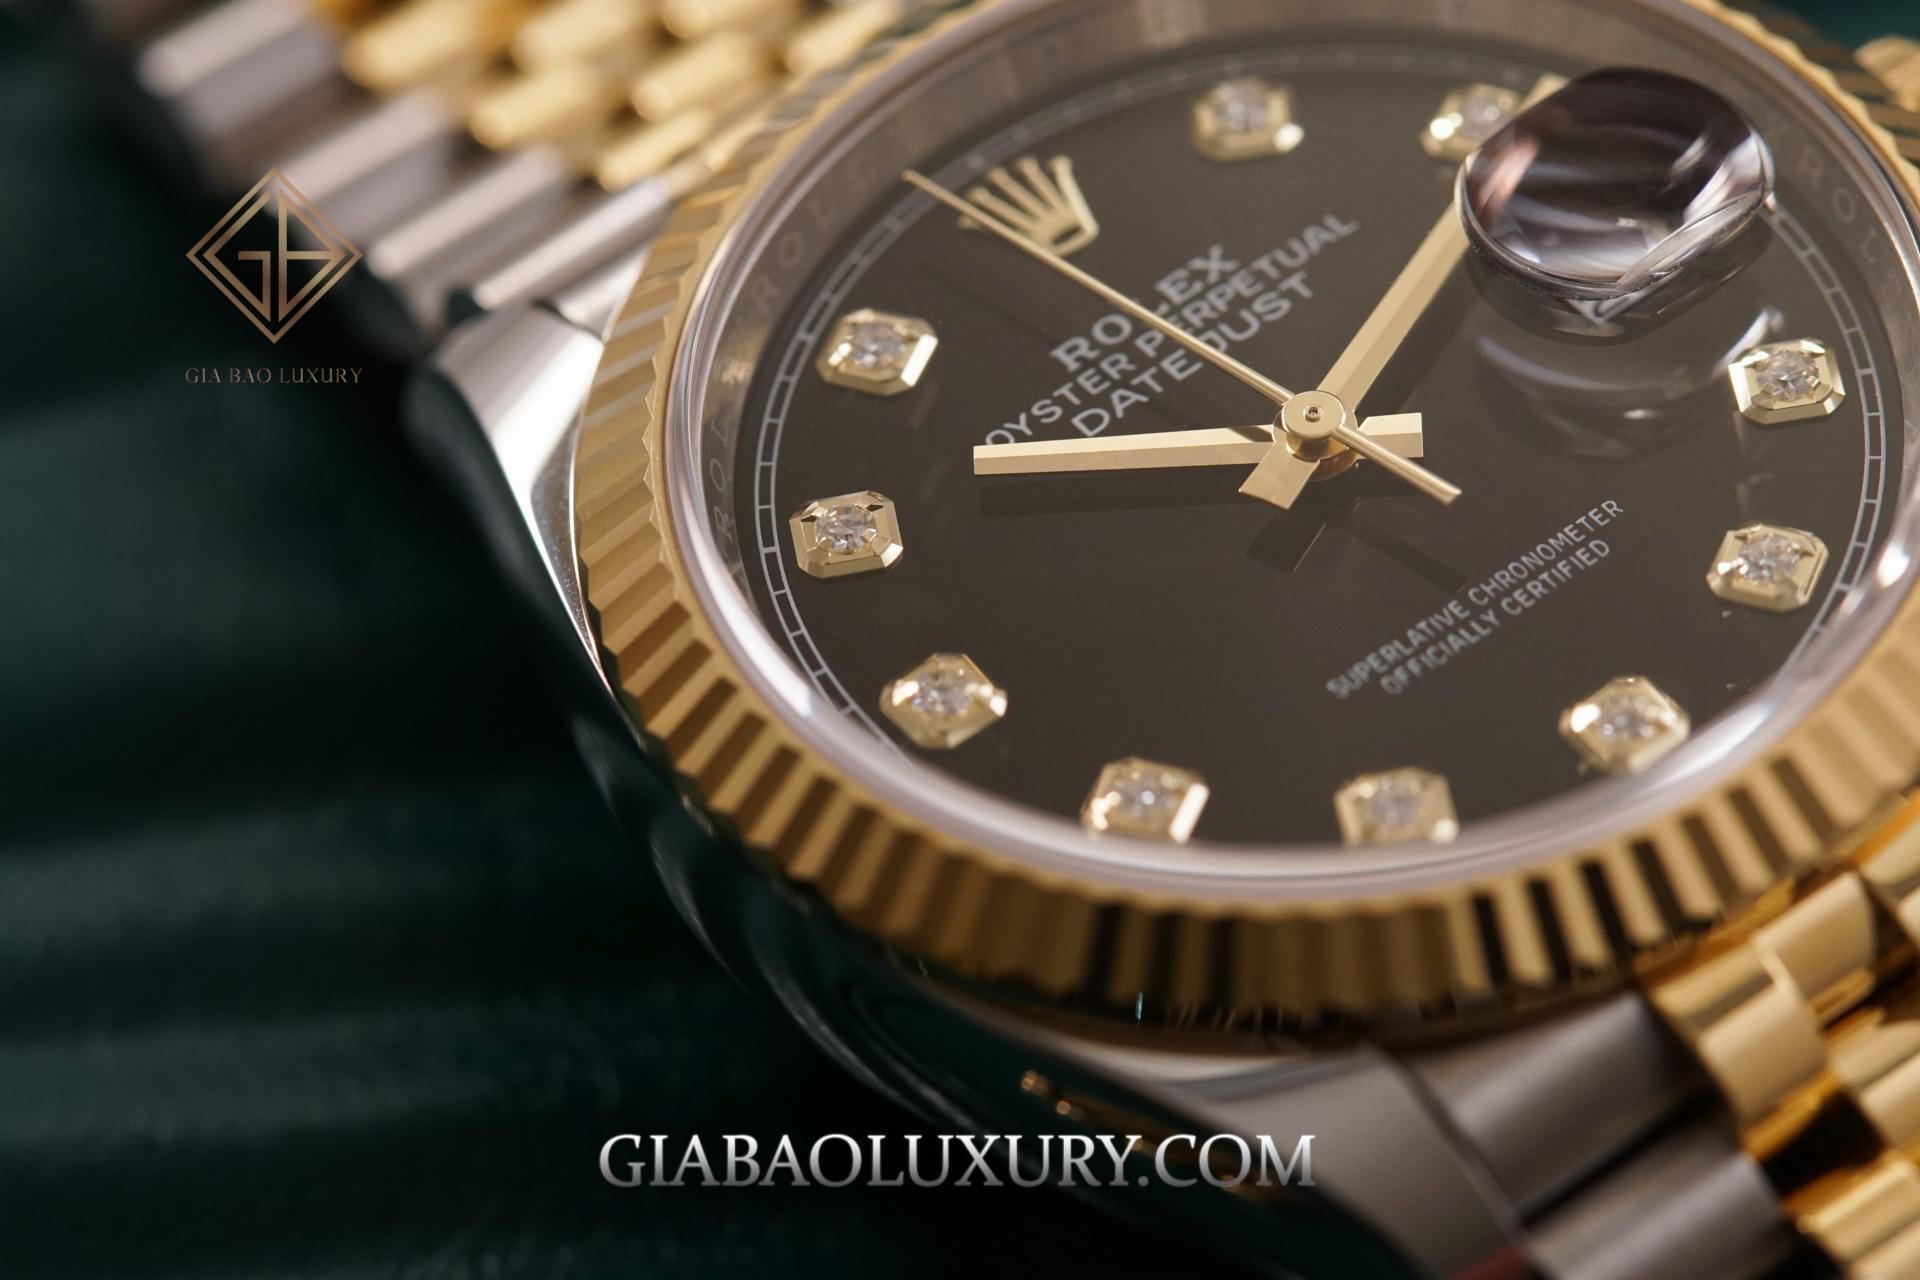 Đồng Hồ Rolex Datejust 36 126233 Mặt Số Đen Nạm Kim Cương